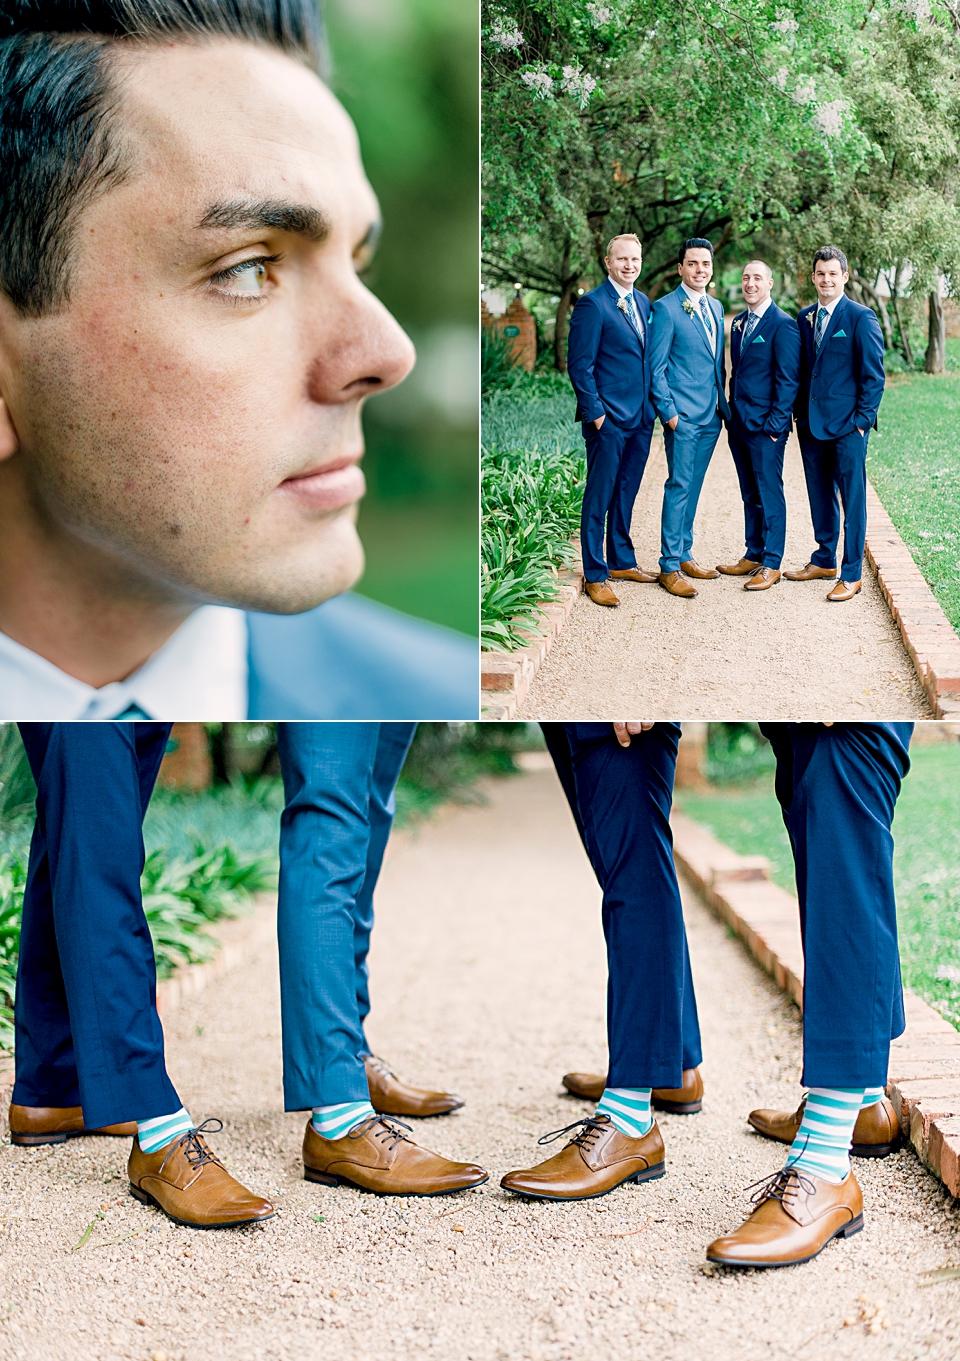 RyanParker_WeddingPhotographer_Johannesburg_TheHertford_M&L_DSC_7846_RyanParker_FineArtPhotographer_CapeTown_CopyRight_.jpg